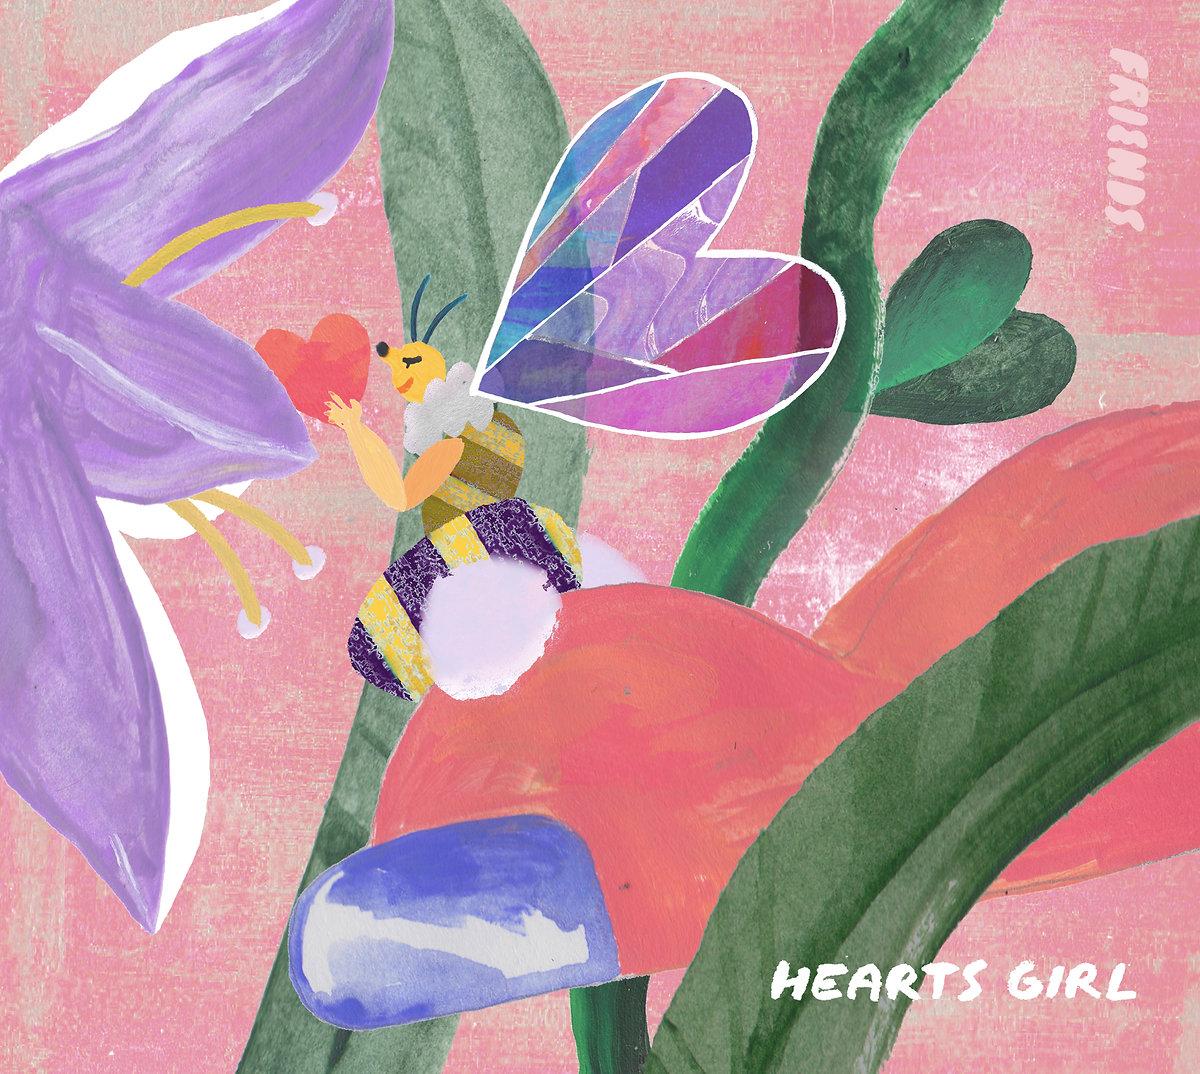 HEARTS  GIRL B.jpg